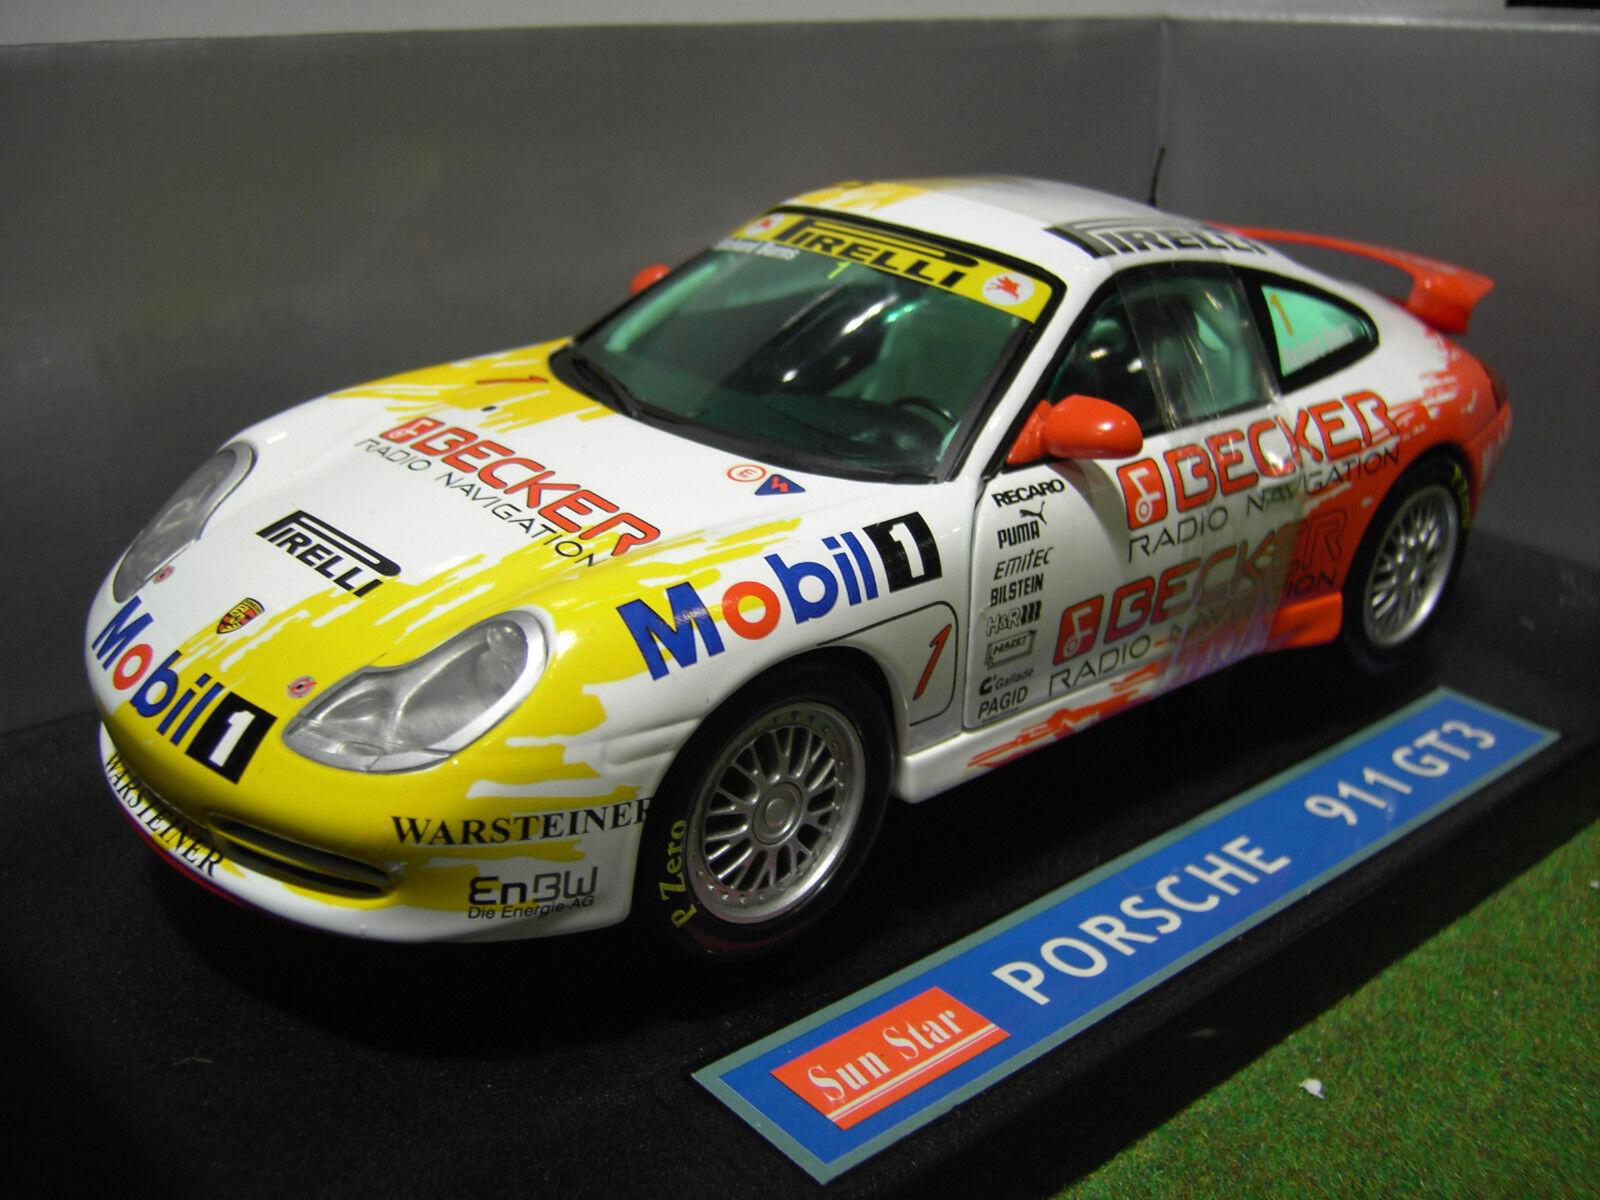 PORSCHE 911 GT3 type 996 Circuit au 1 18 SUNSTAR SUN STAR 1292 voiture miniature